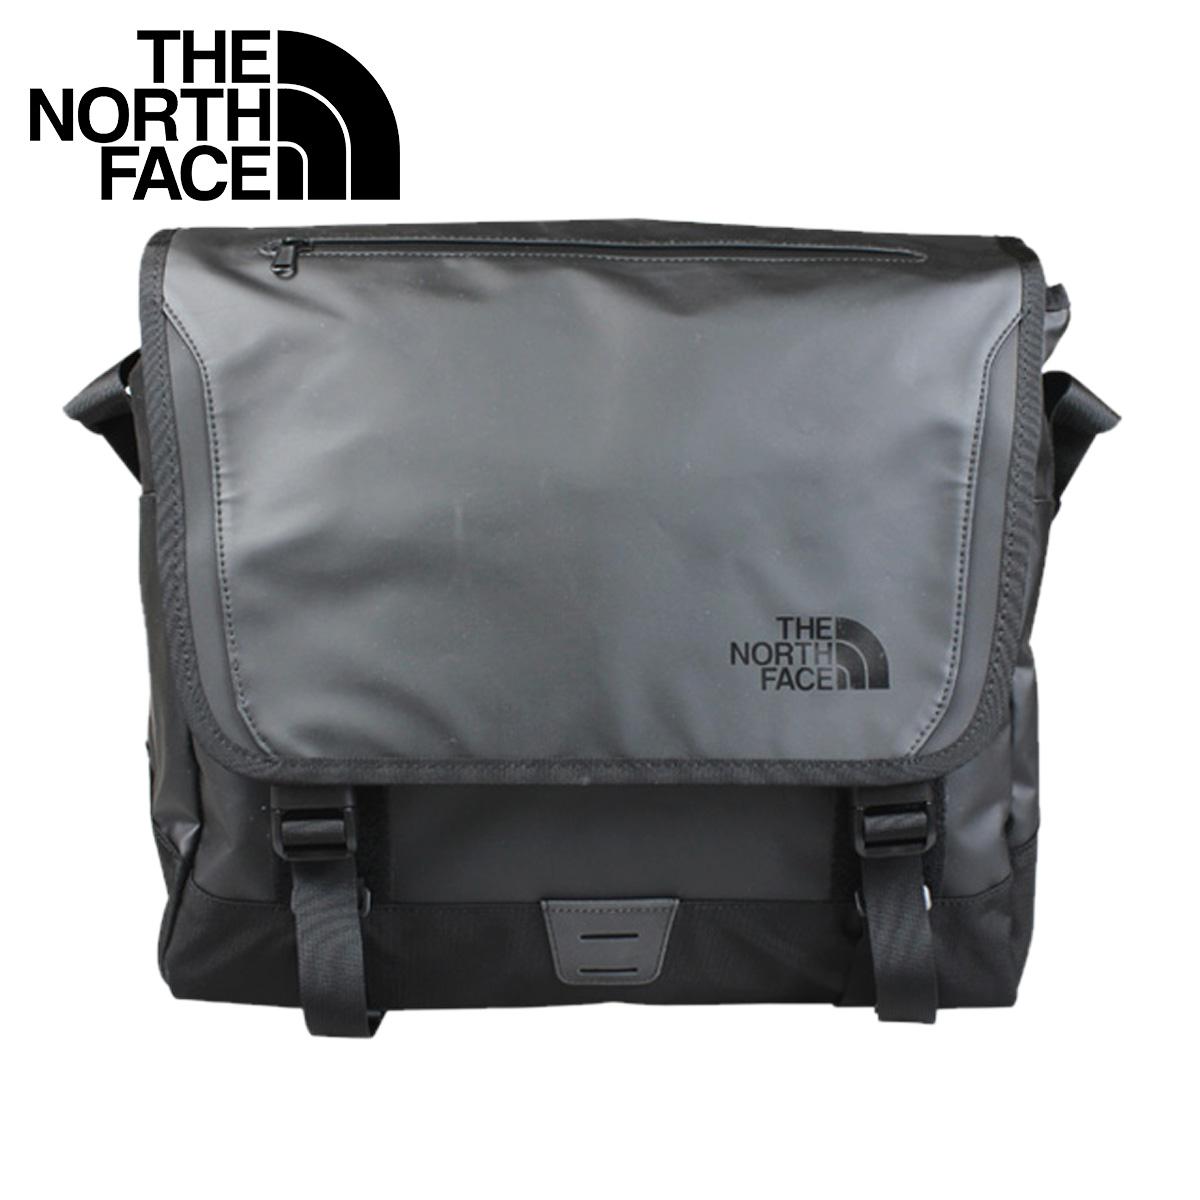 allsports the north face the north face messenger bag men. Black Bedroom Furniture Sets. Home Design Ideas